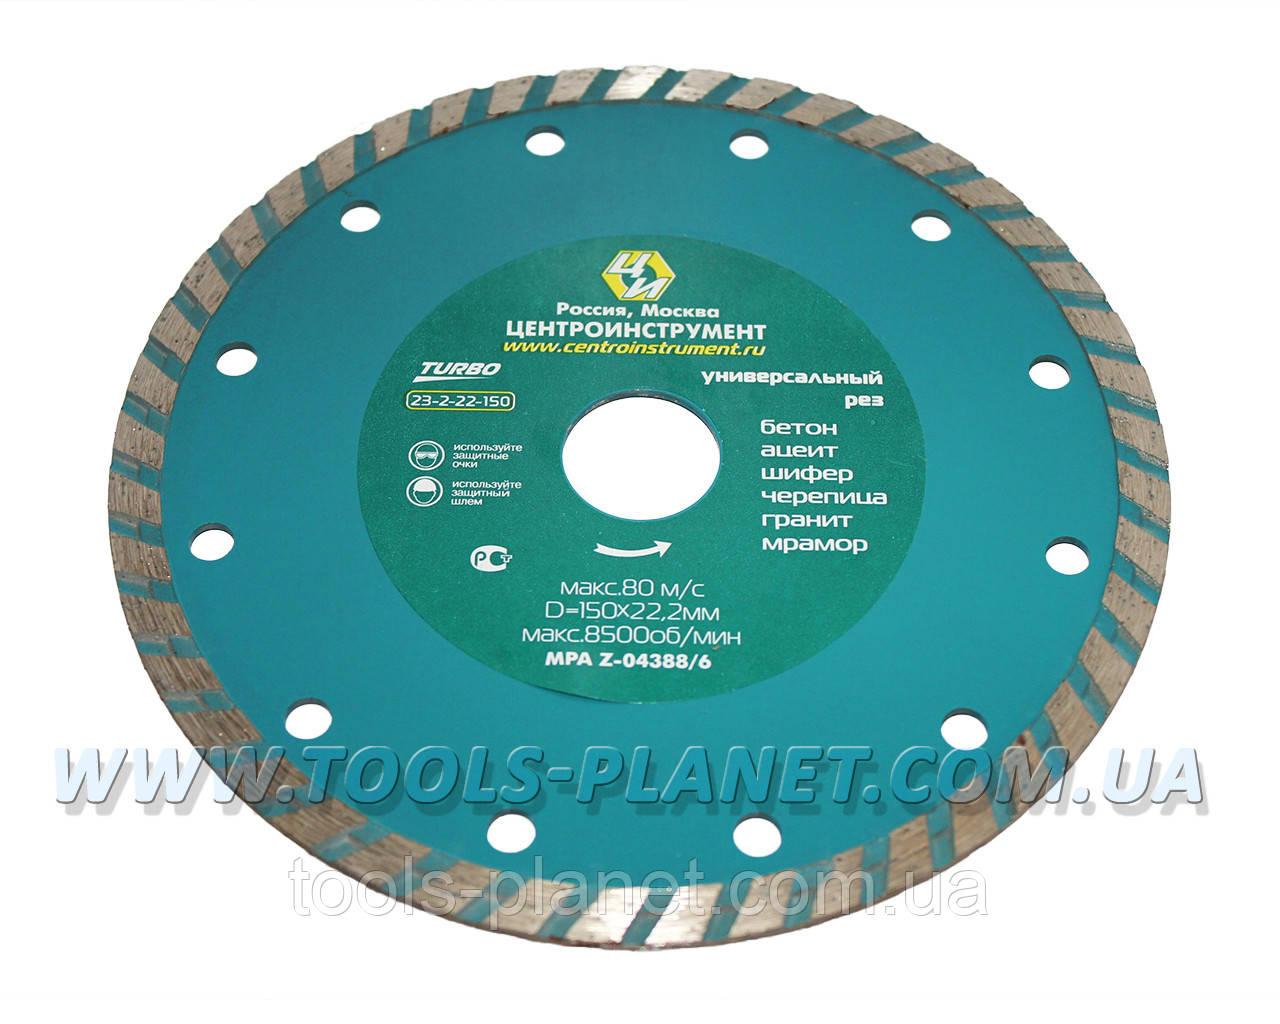 Алмазный диск Центроинструмент 150 х 7 х 22,23 Турбо